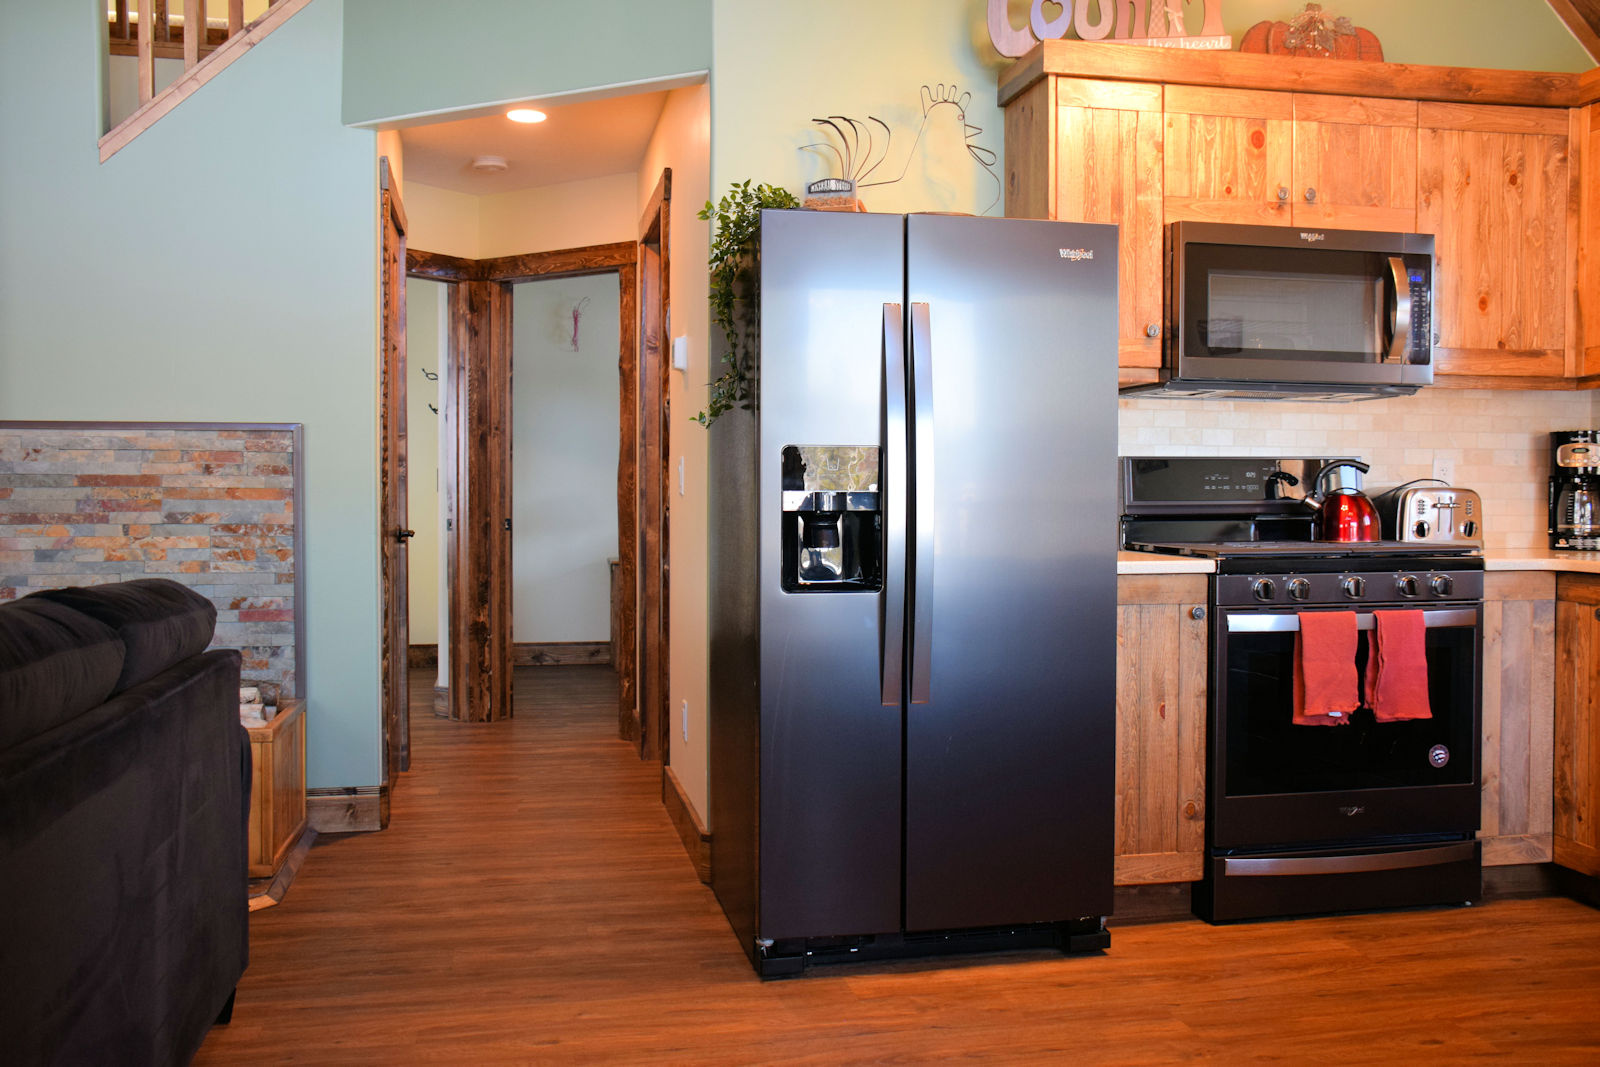 https://0901.nccdn.net/4_2/000/000/071/260/kitchen-and-hallway-1600x1067.jpg